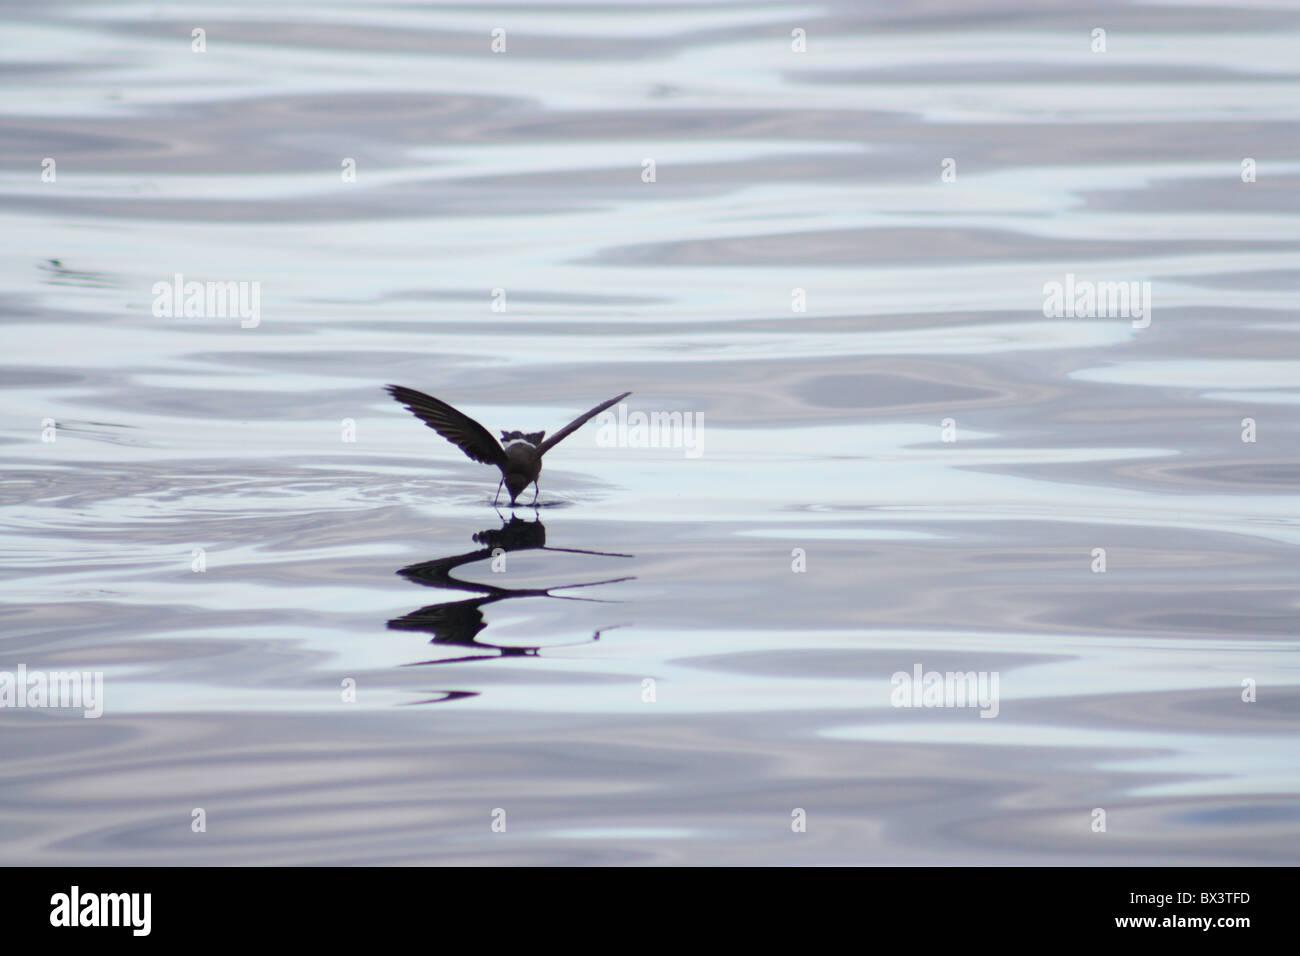 Storm Petrel Walking on Water, Galapagos Islands - Stock Image